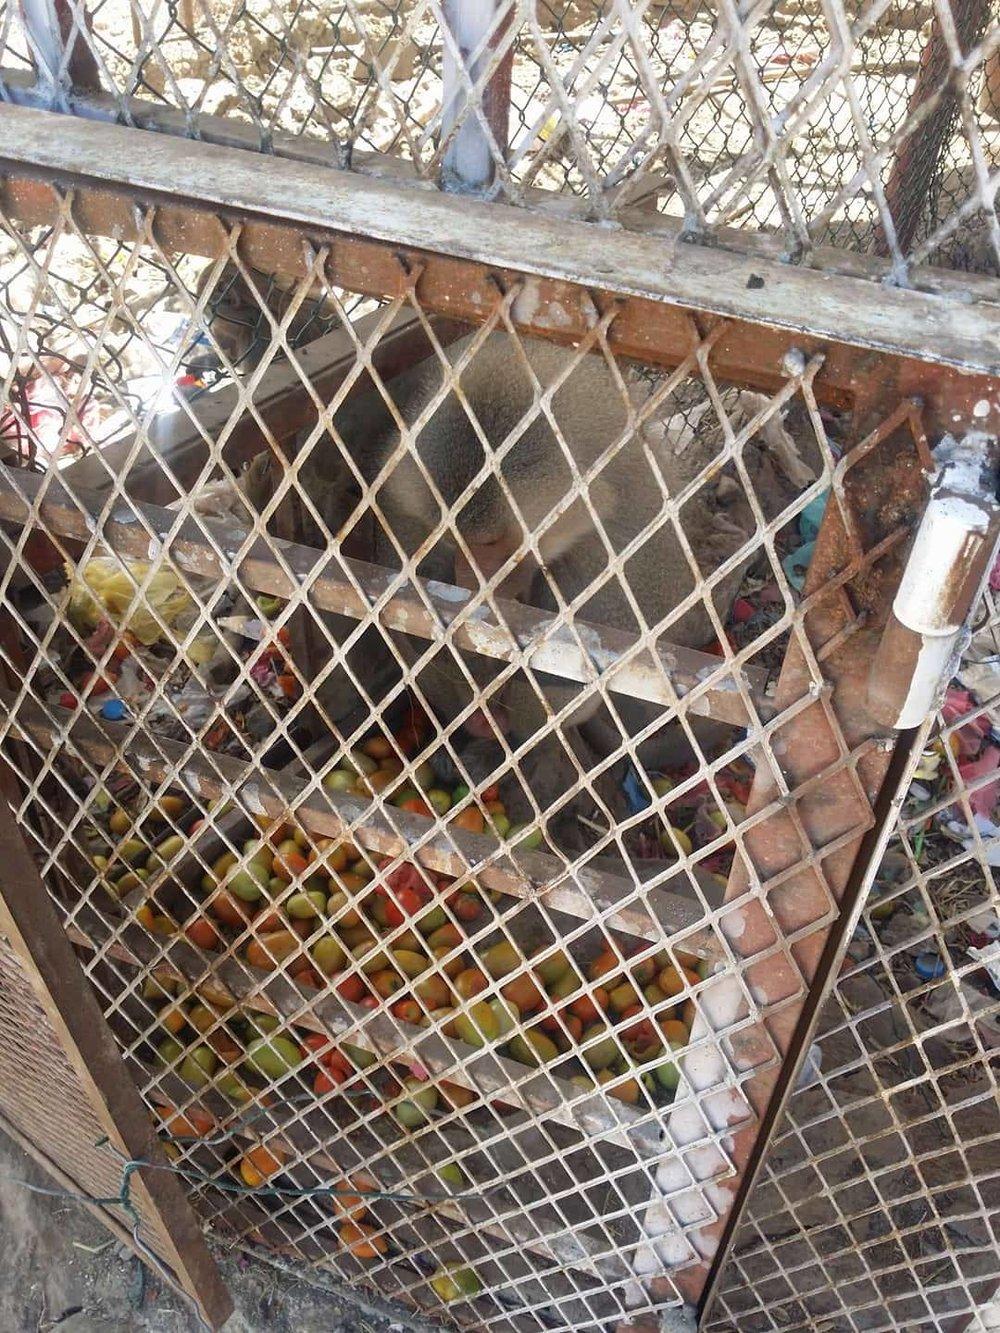 Ibb Zoo 4 Jan 2018 OWAP AR Salman delivery  baboon with fruit .jpg